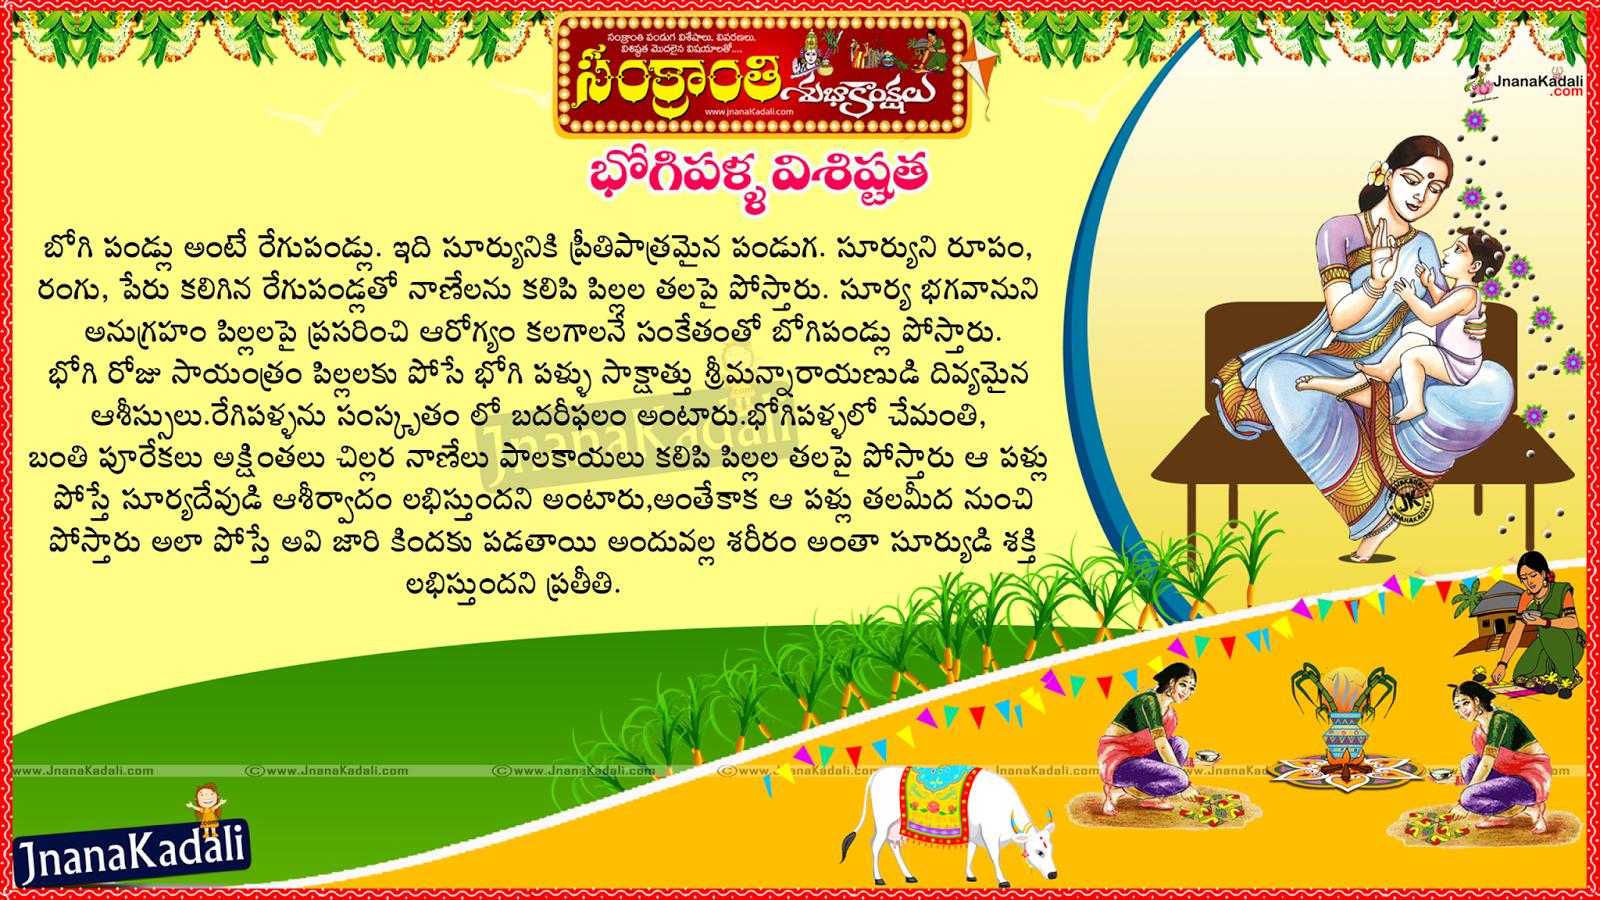 {PDF Download}* Makar Sankranti / Kite Day Speech & Essay in English, Hindi, Marathi & Malayalam